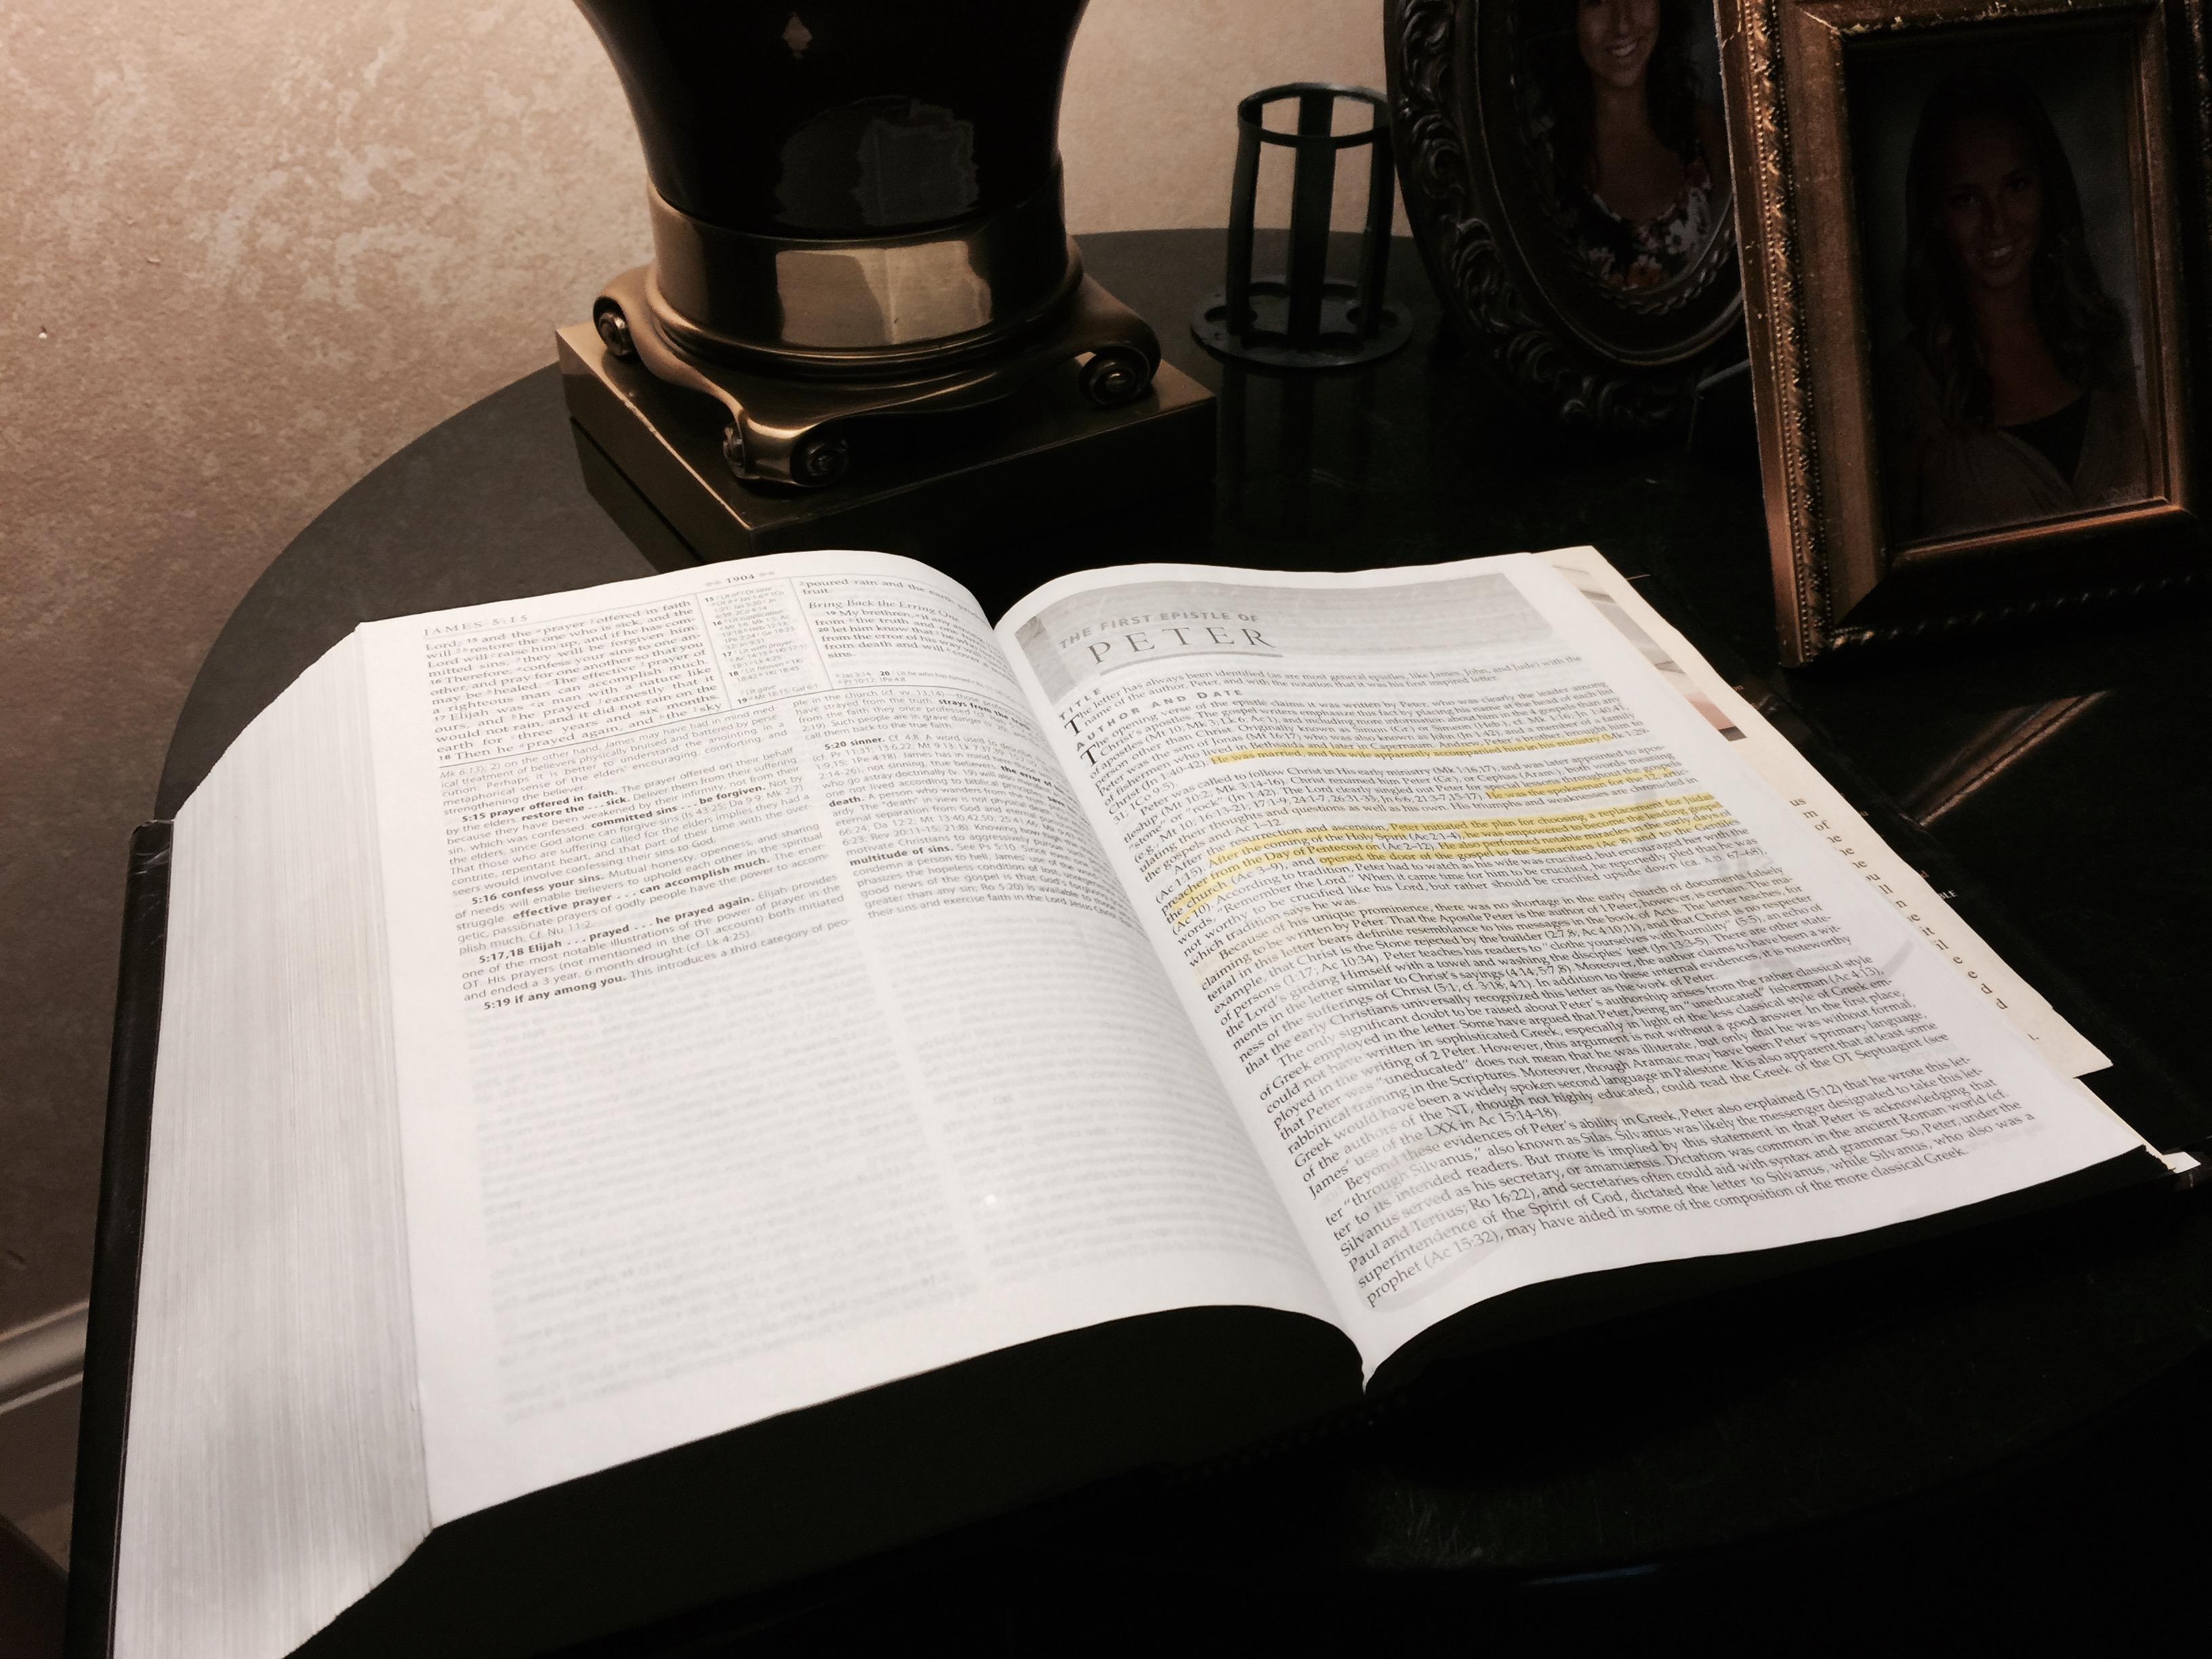 15 Helpful Bible Verses About Mental Illness